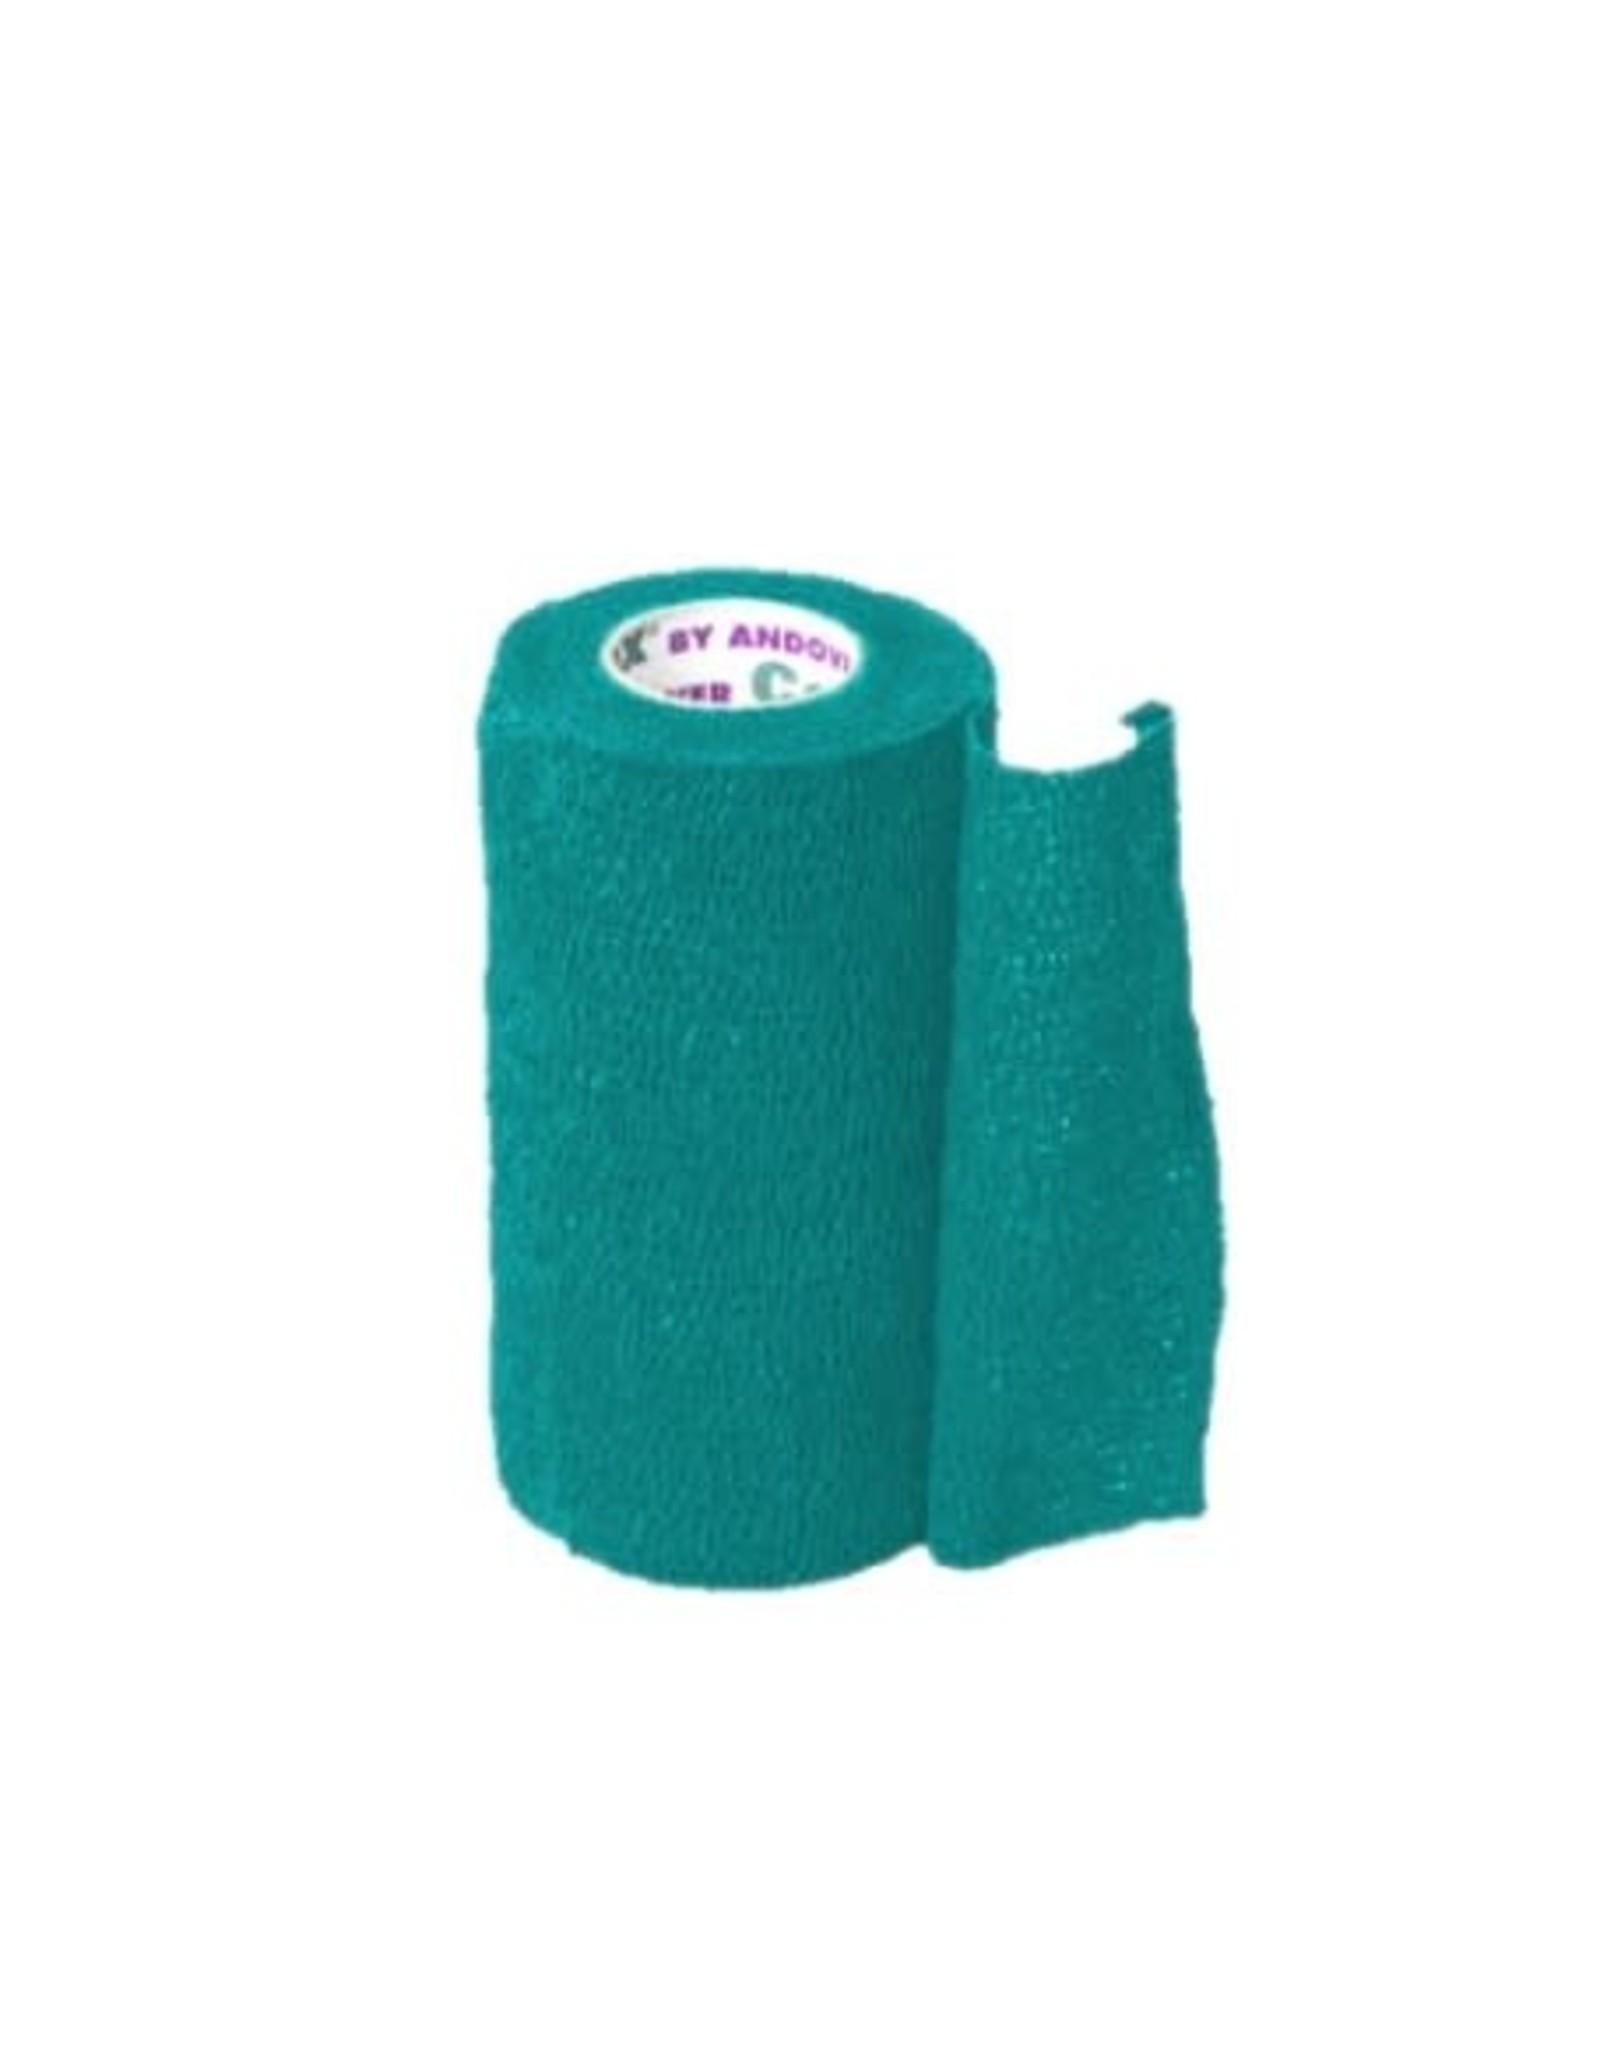 "3M Coflex Cohesive Bandage 4"" x 15'"